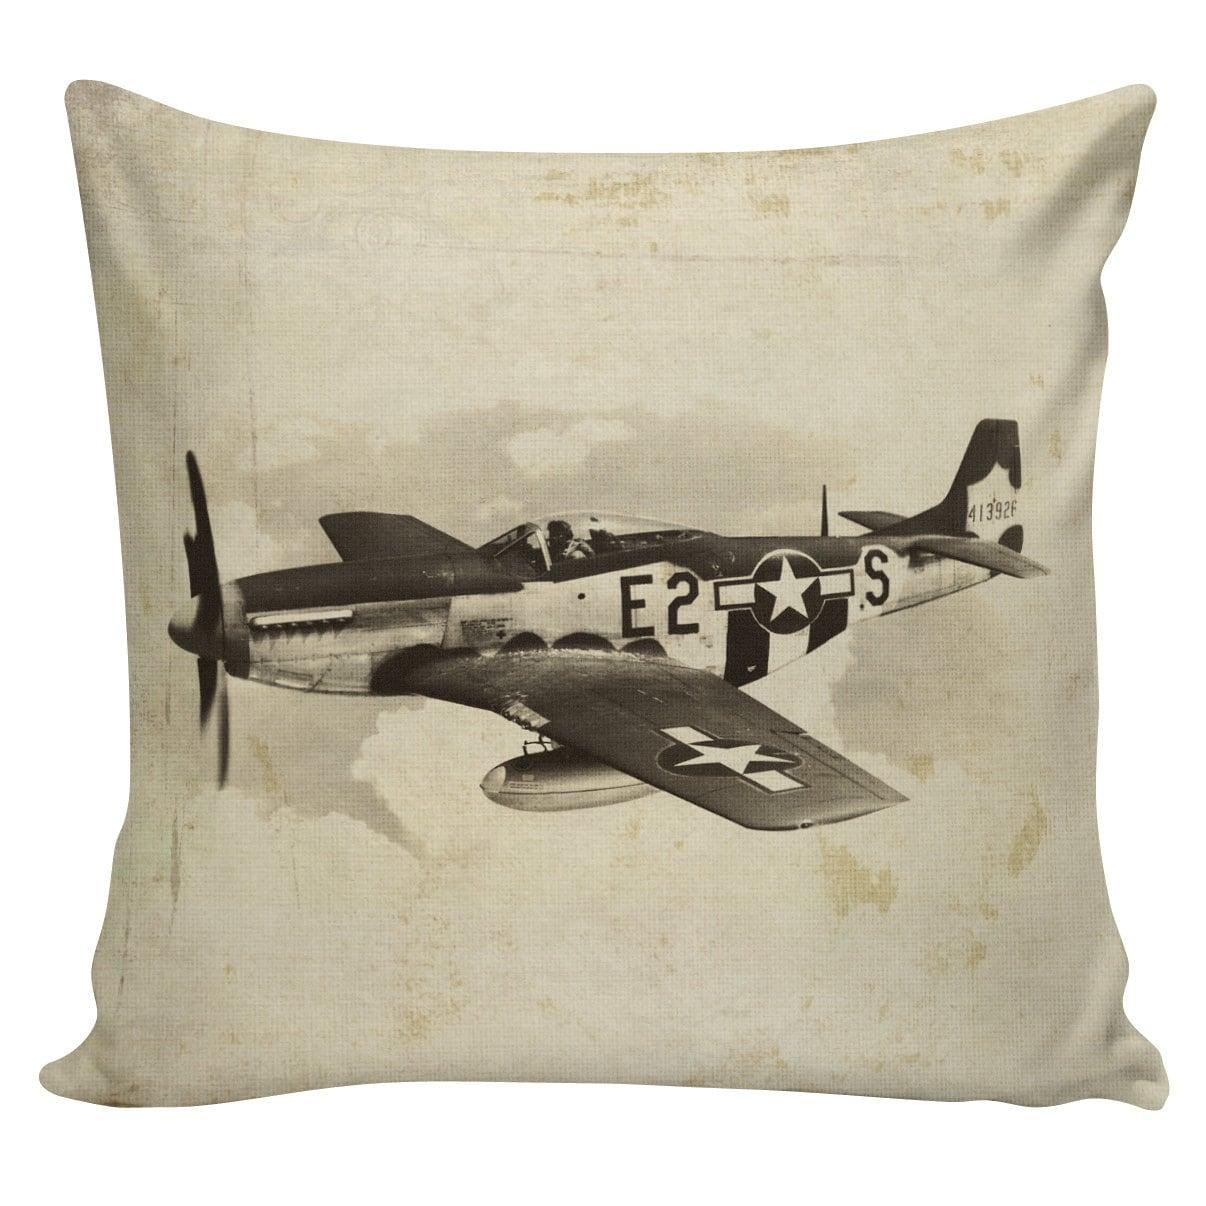 Family History Throw Pillow : Military History Throw Pillow Pillow Cover Military Family